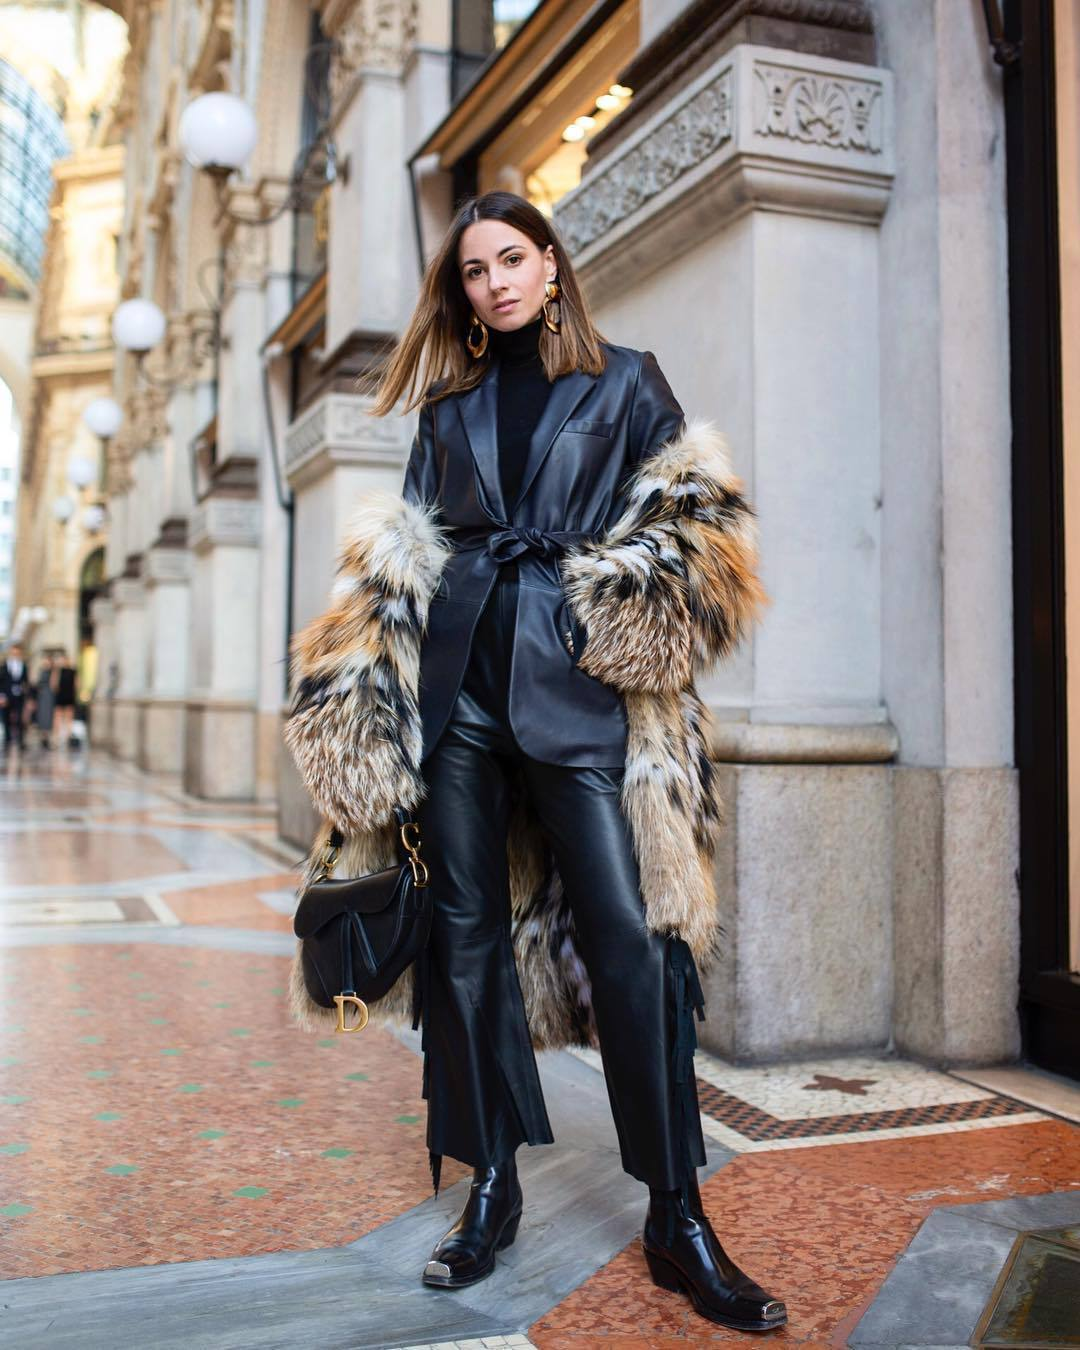 Black High waist Pants with Leather Jacket